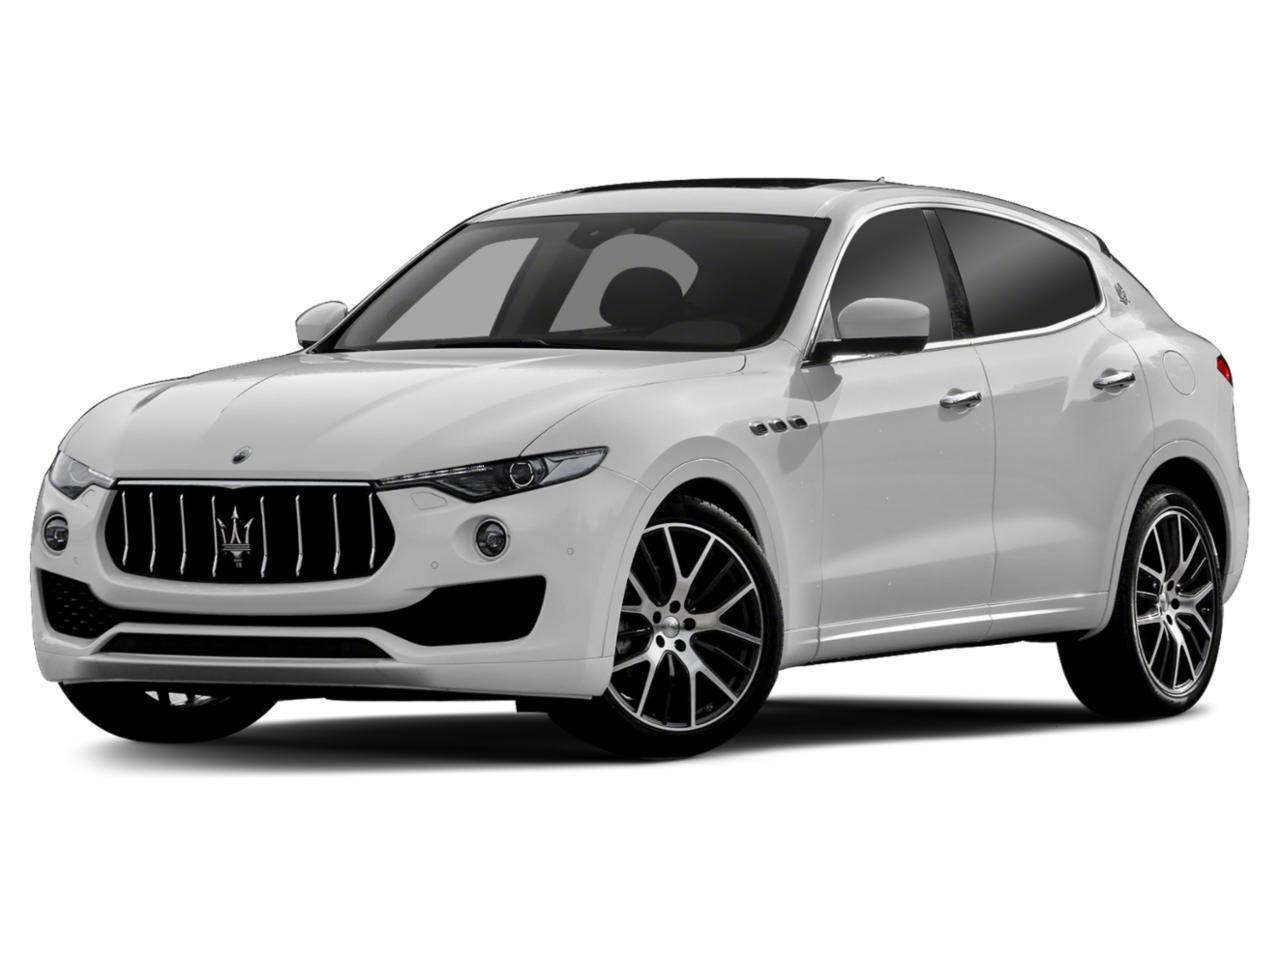 2020 Maserati Levante Vehicle Photo in Appleton, WI 54913